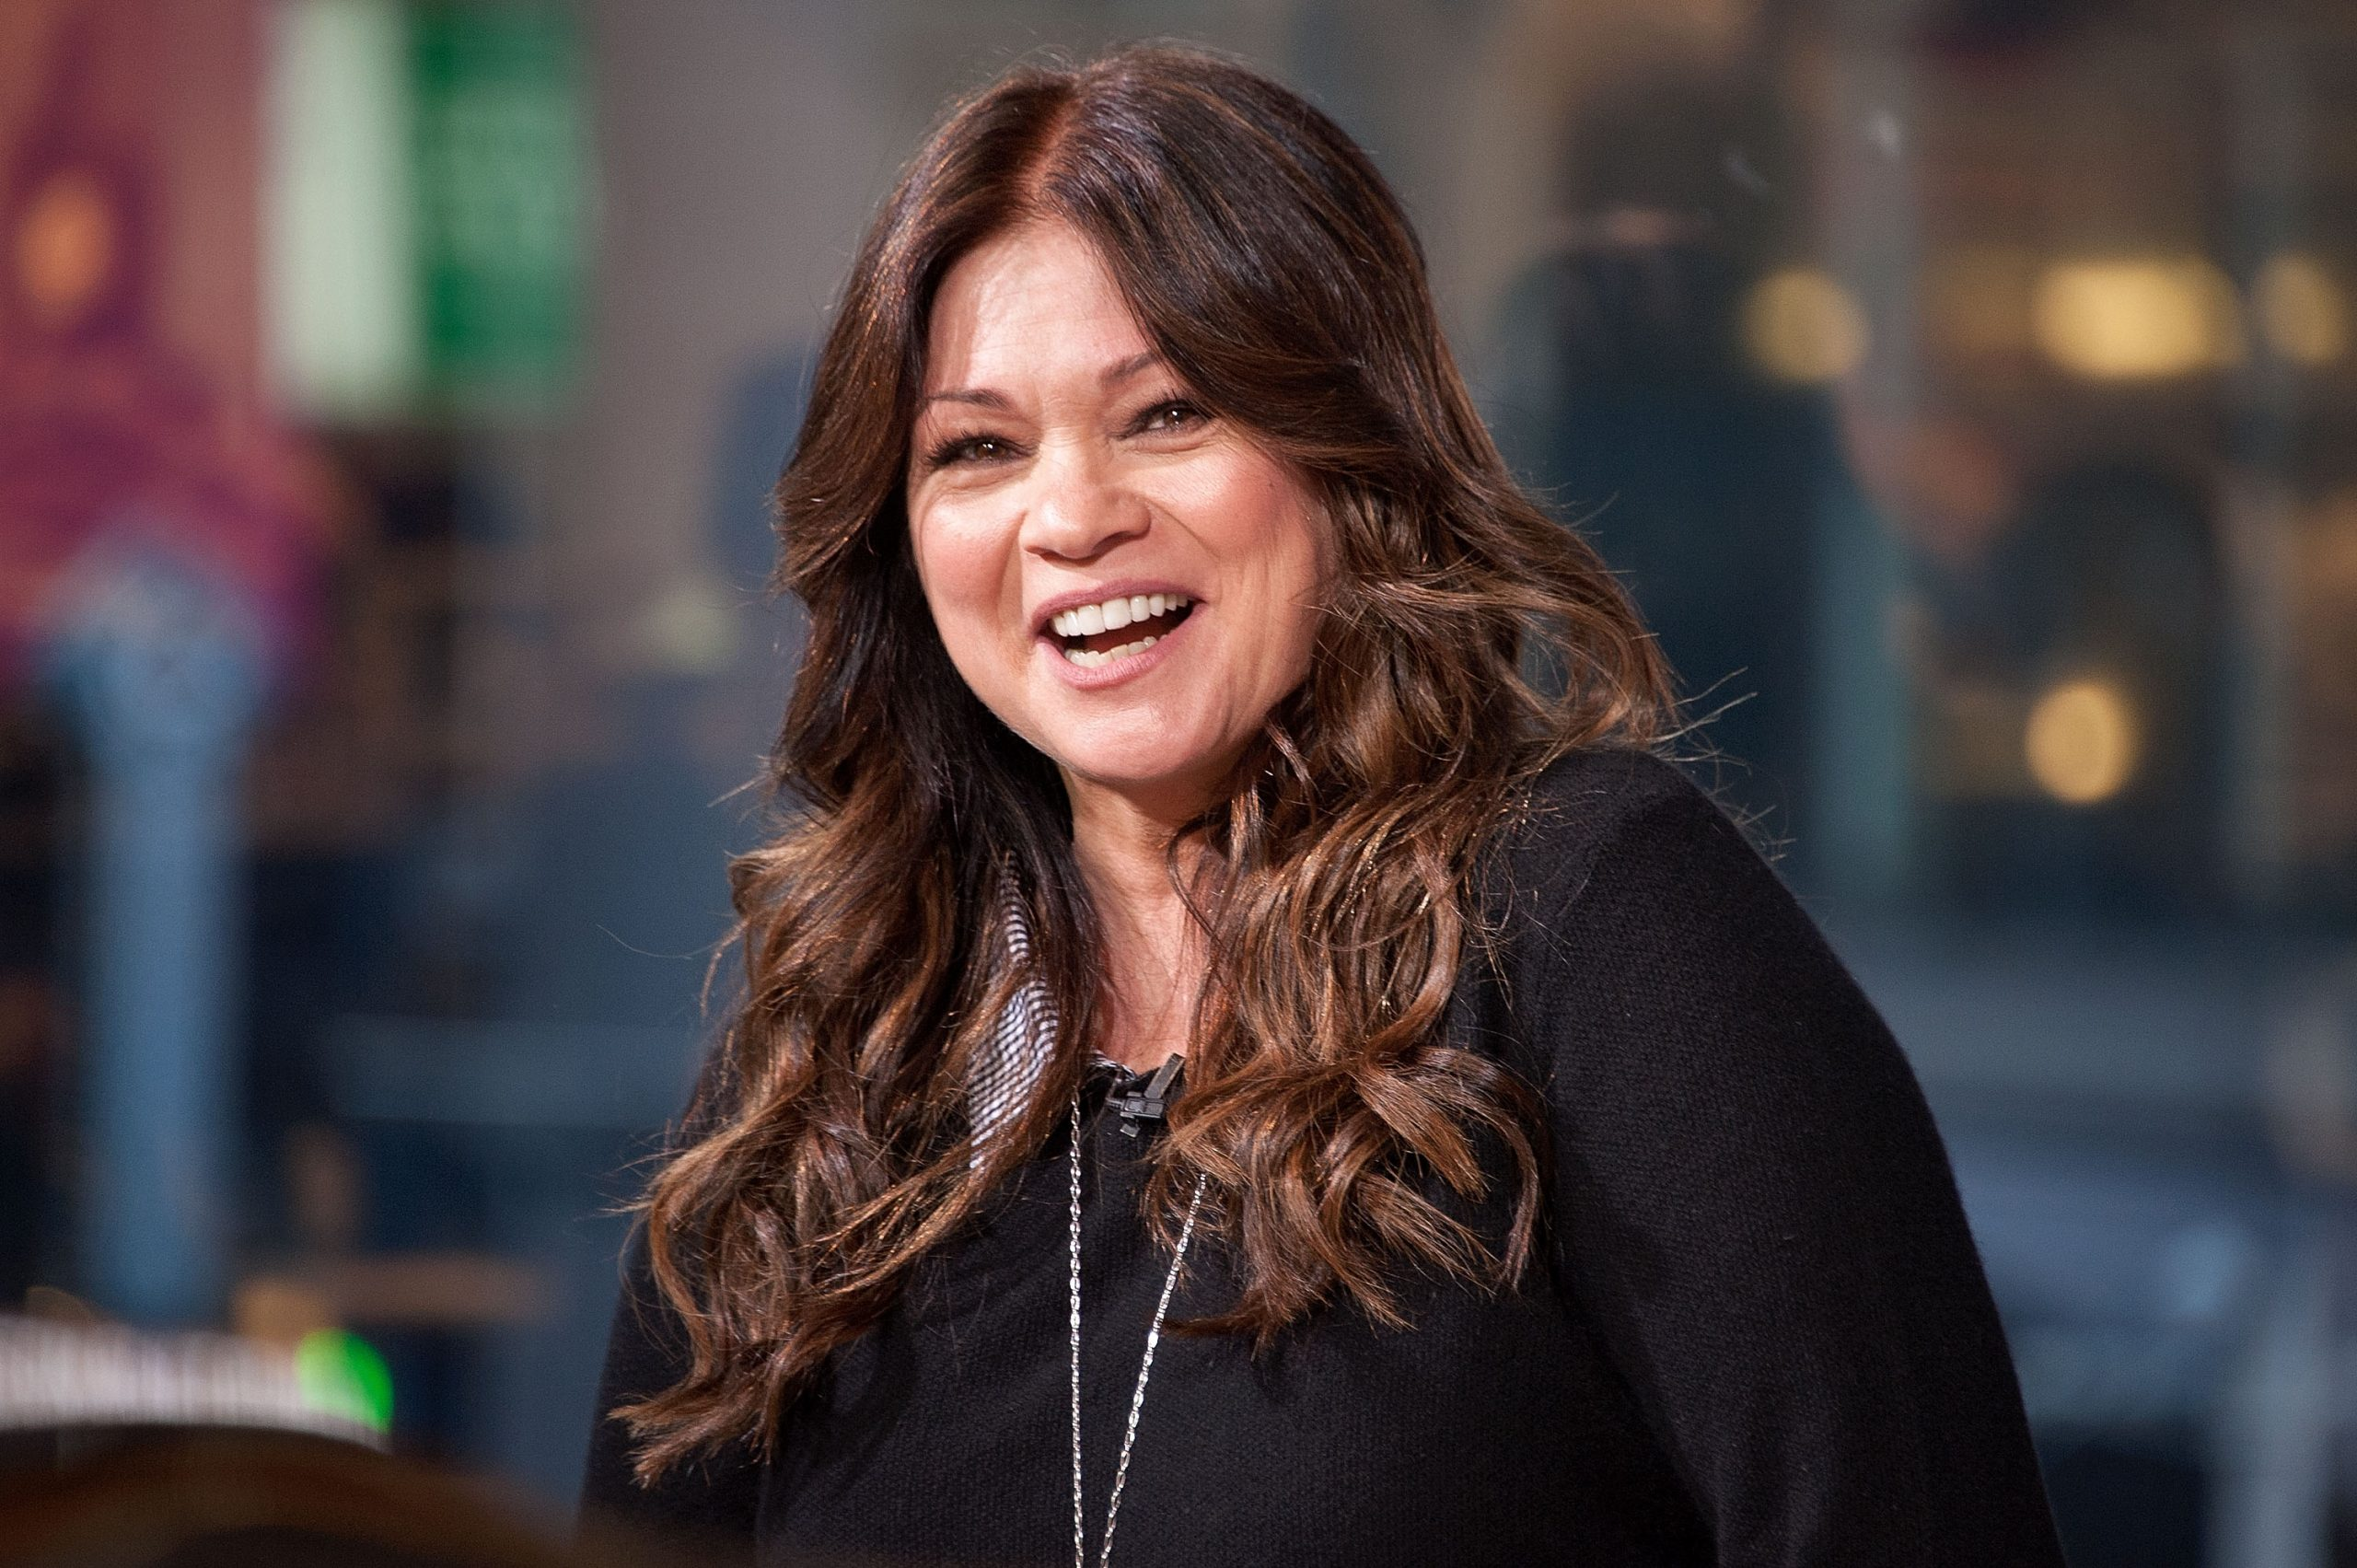 Food Network host Valerie Bertinelli